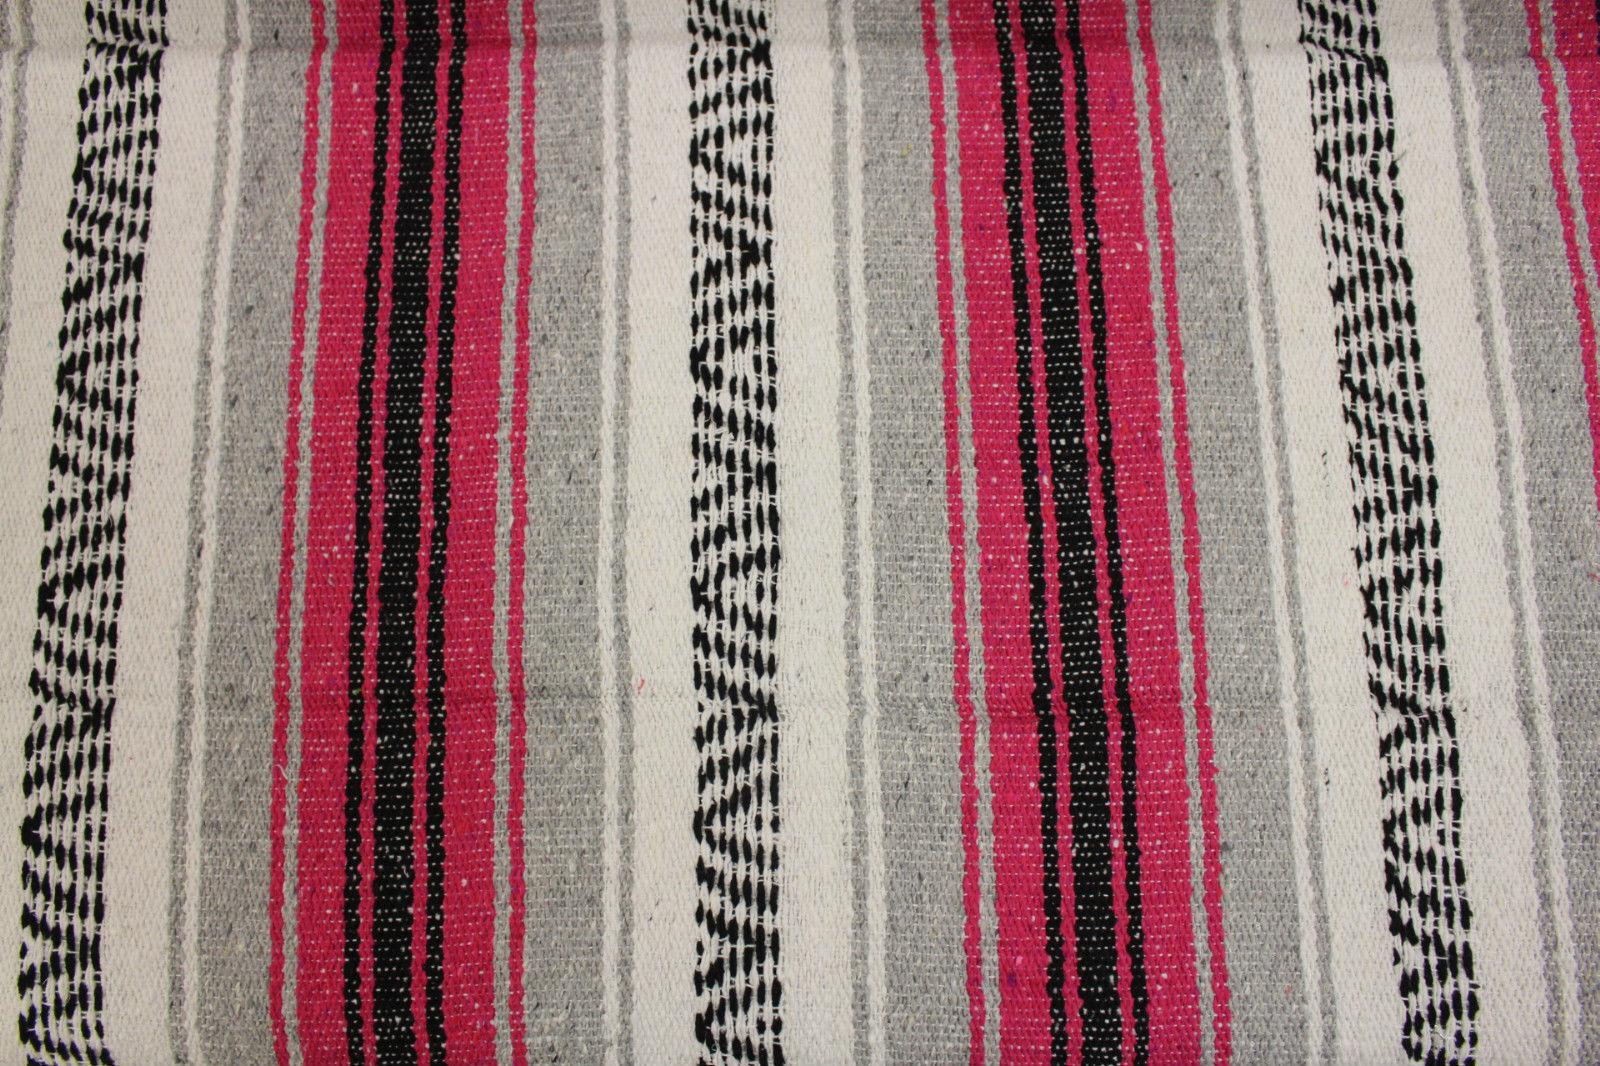 Genuine Mexican falsa western blanket in a pink & grey theme throw mat yoga rug